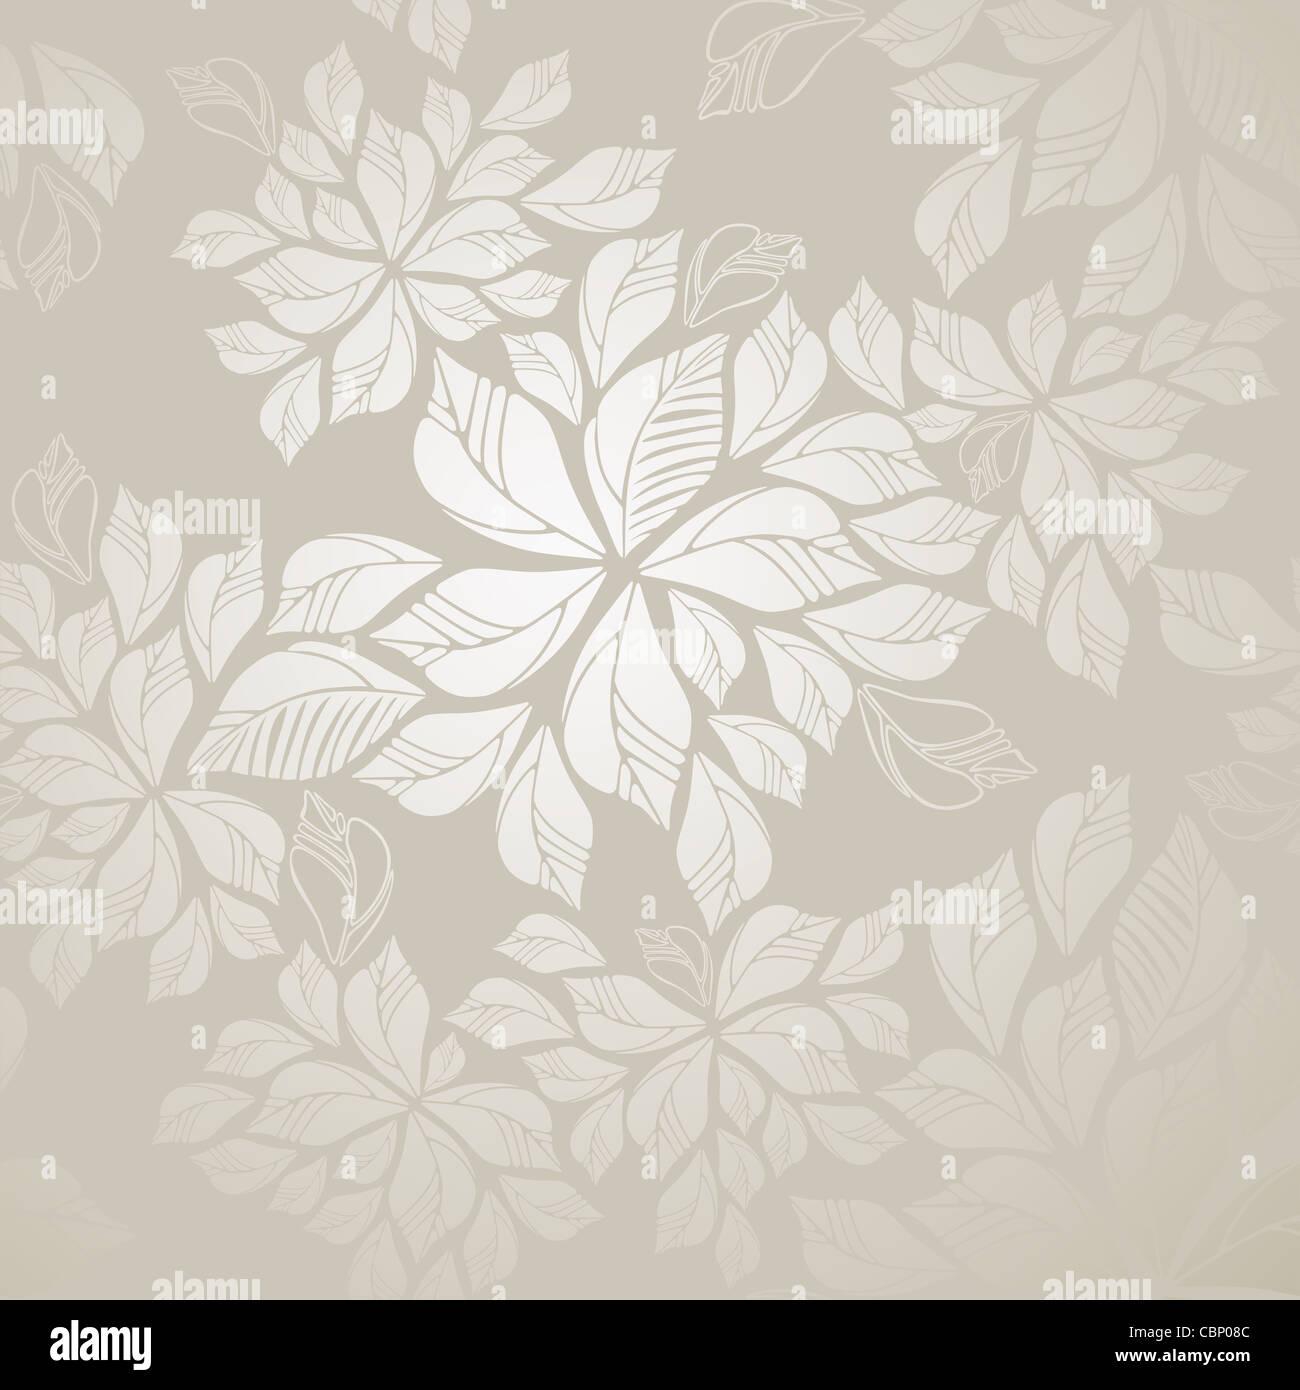 Fall Leaves Hd Mobile Wallpaper Seamless Grey Silver Leaves Foliage Wallpaper Pattern